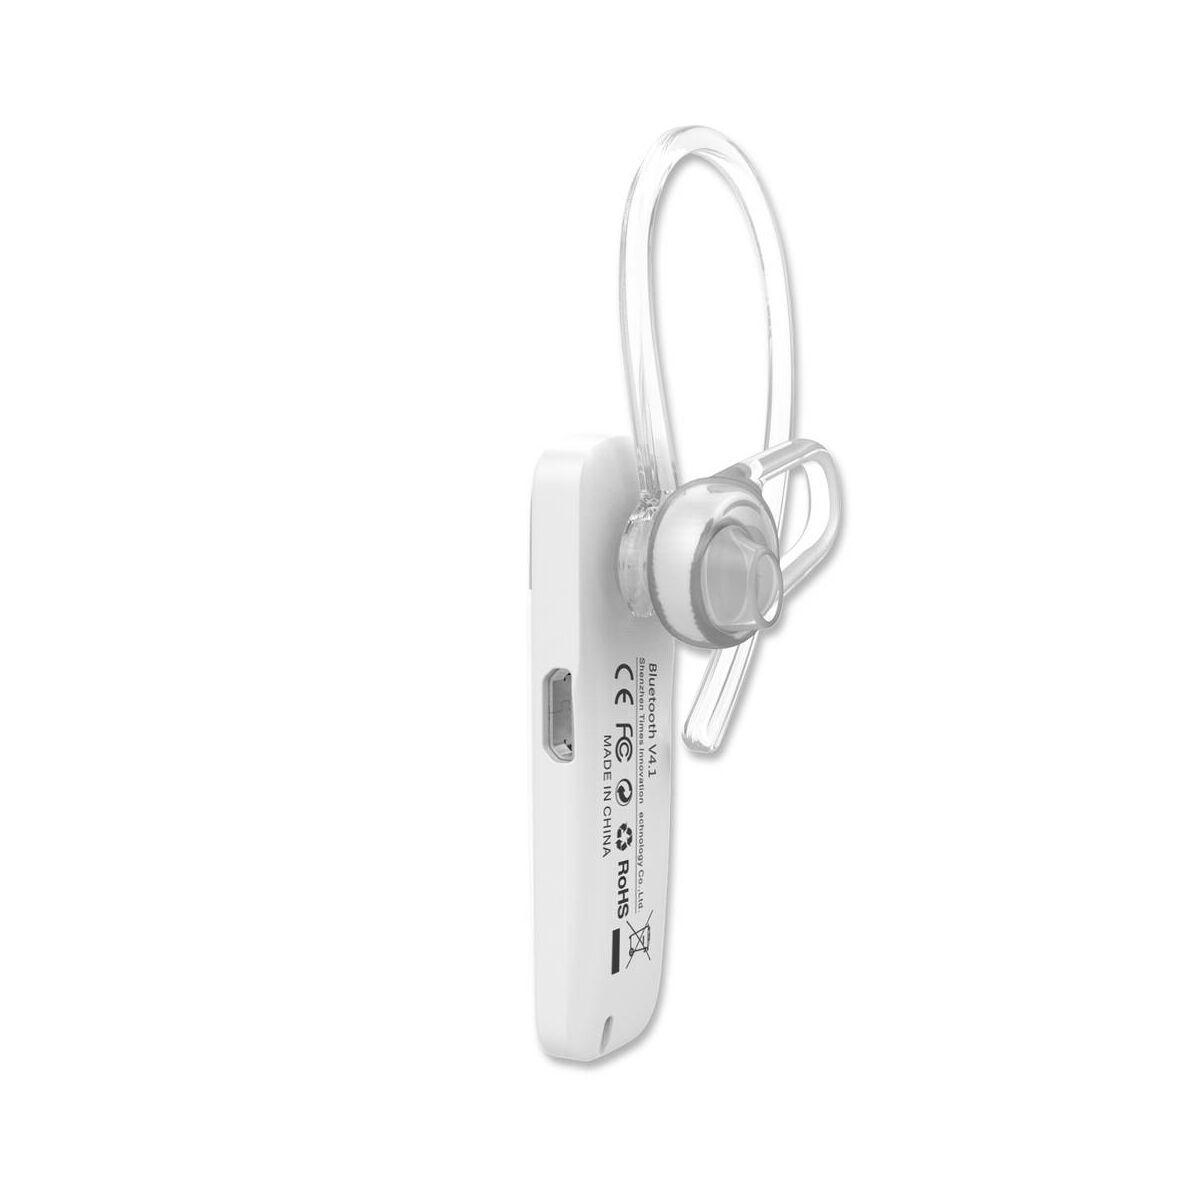 Baseus Headset Bluetooth, Timk series, fehér (AUBASETK-02)